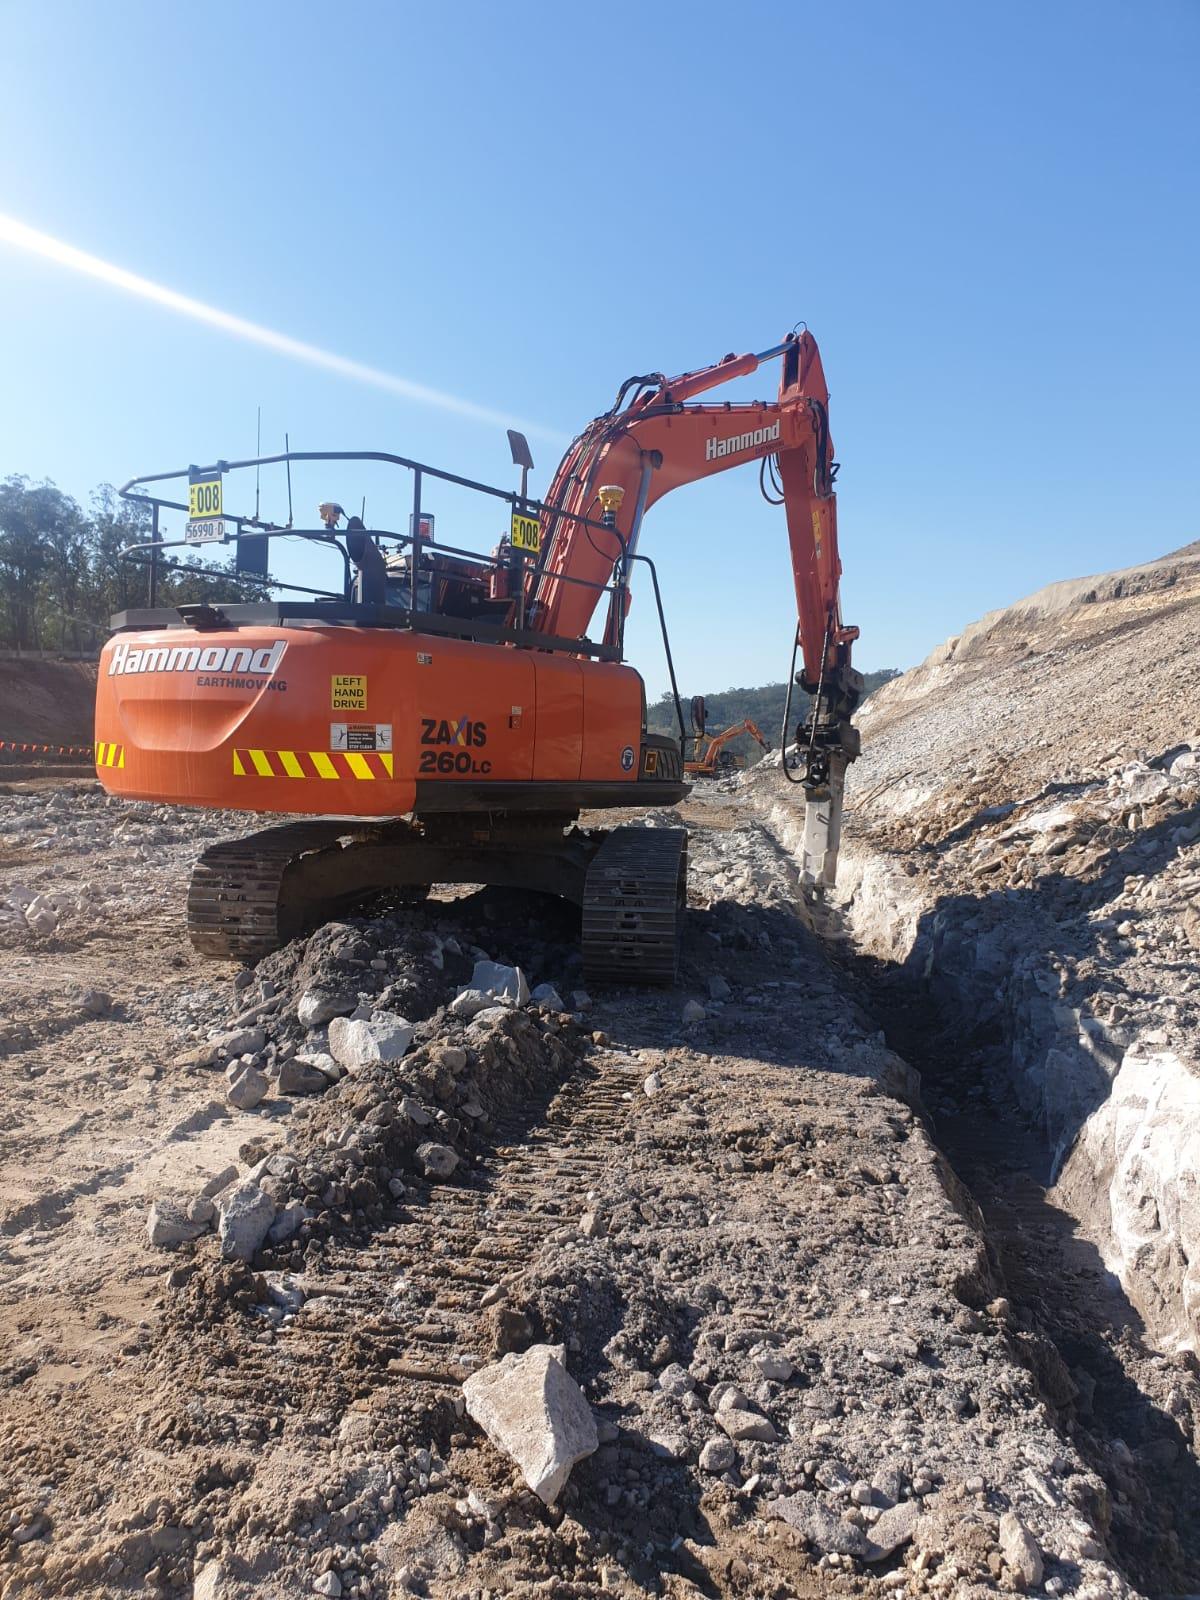 hammond-earthmoving-excavator-for-hire-in-brisbane